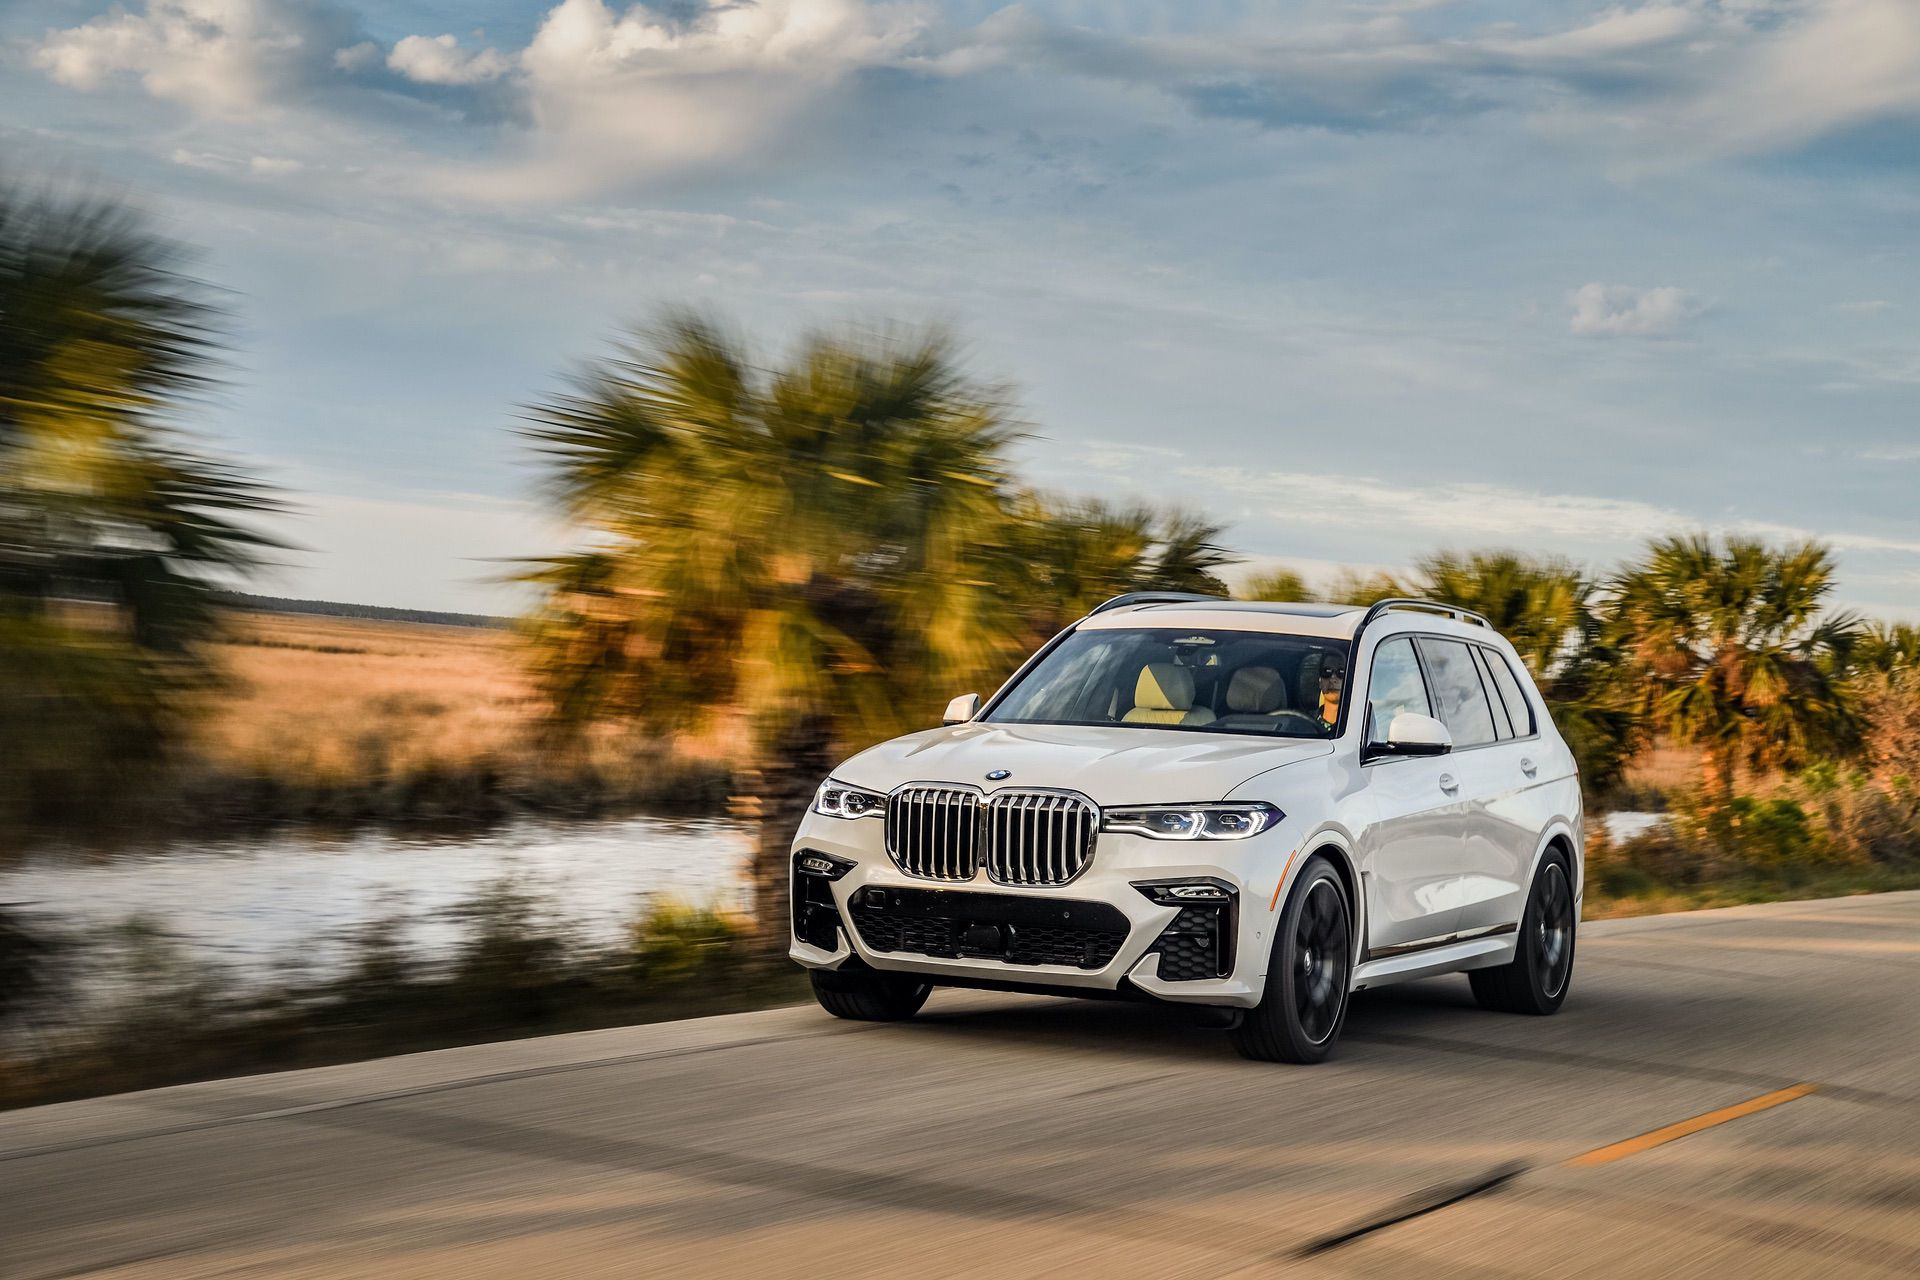 2019 BMW X7 xDrive50i in Mineral White Metallic